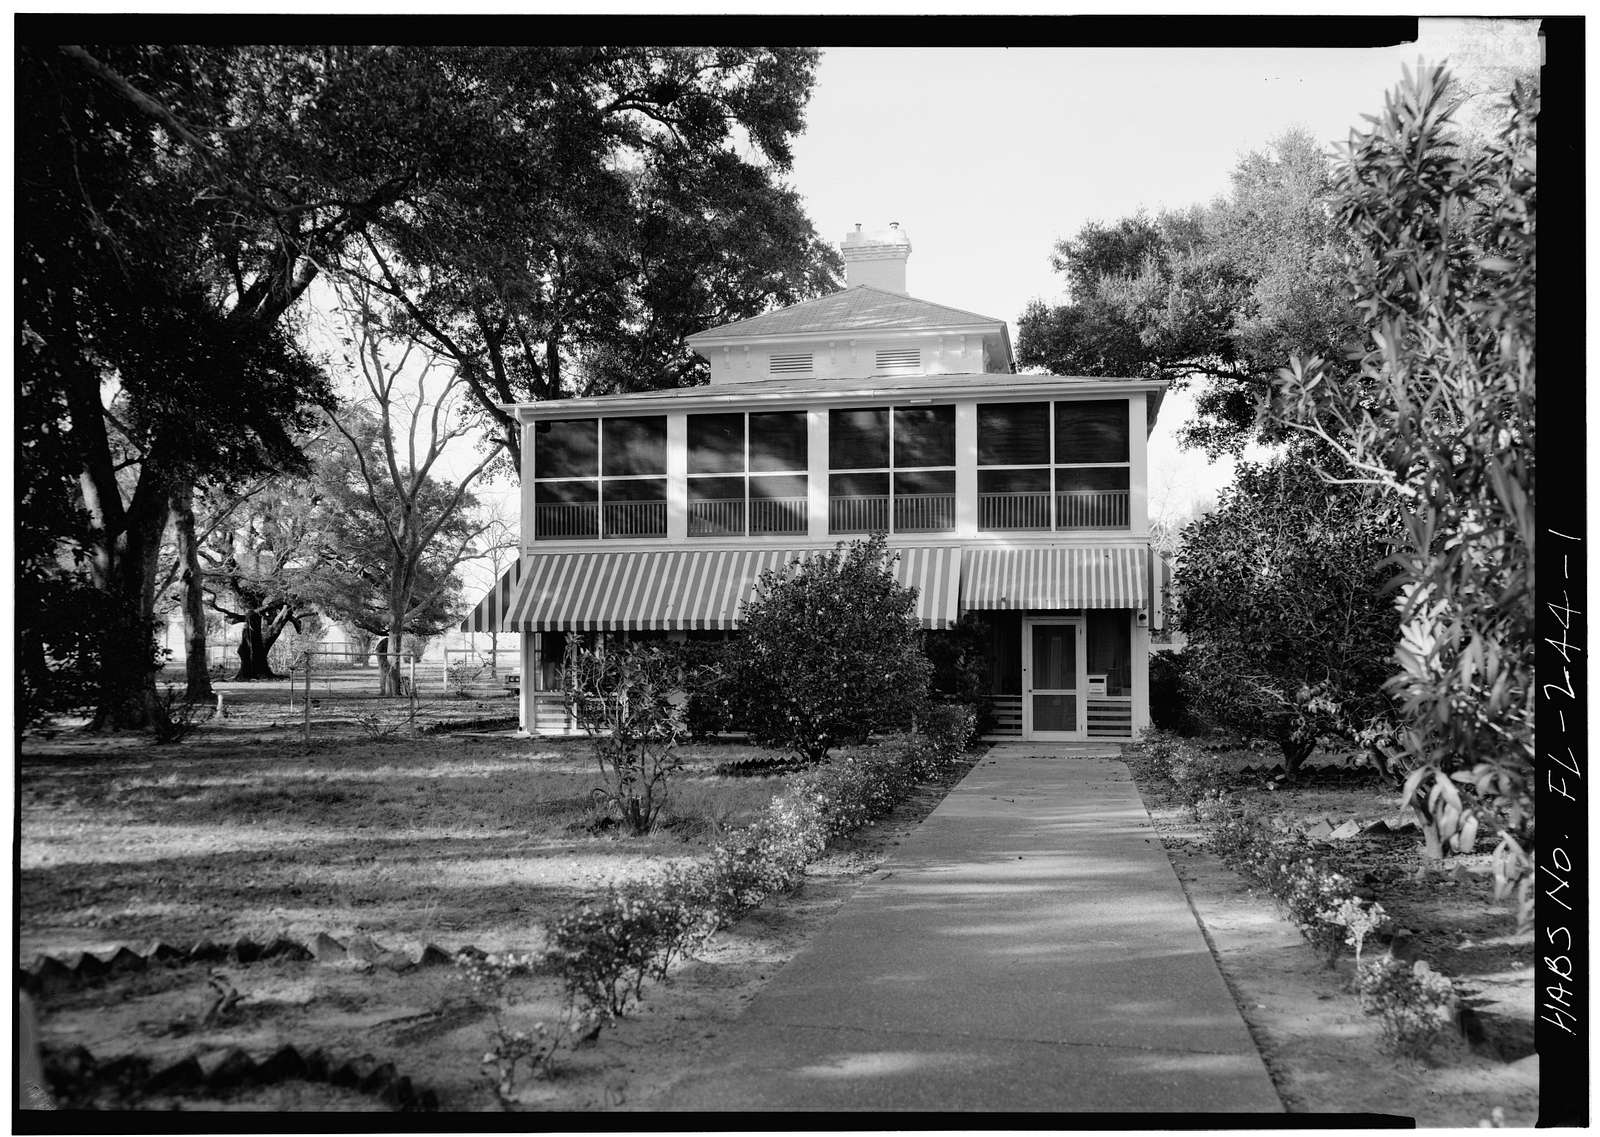 U.S. Naval Air Station, Senior Officers' Quarters, Q-5 North Avenue, Pensacola, Escambia County, FL